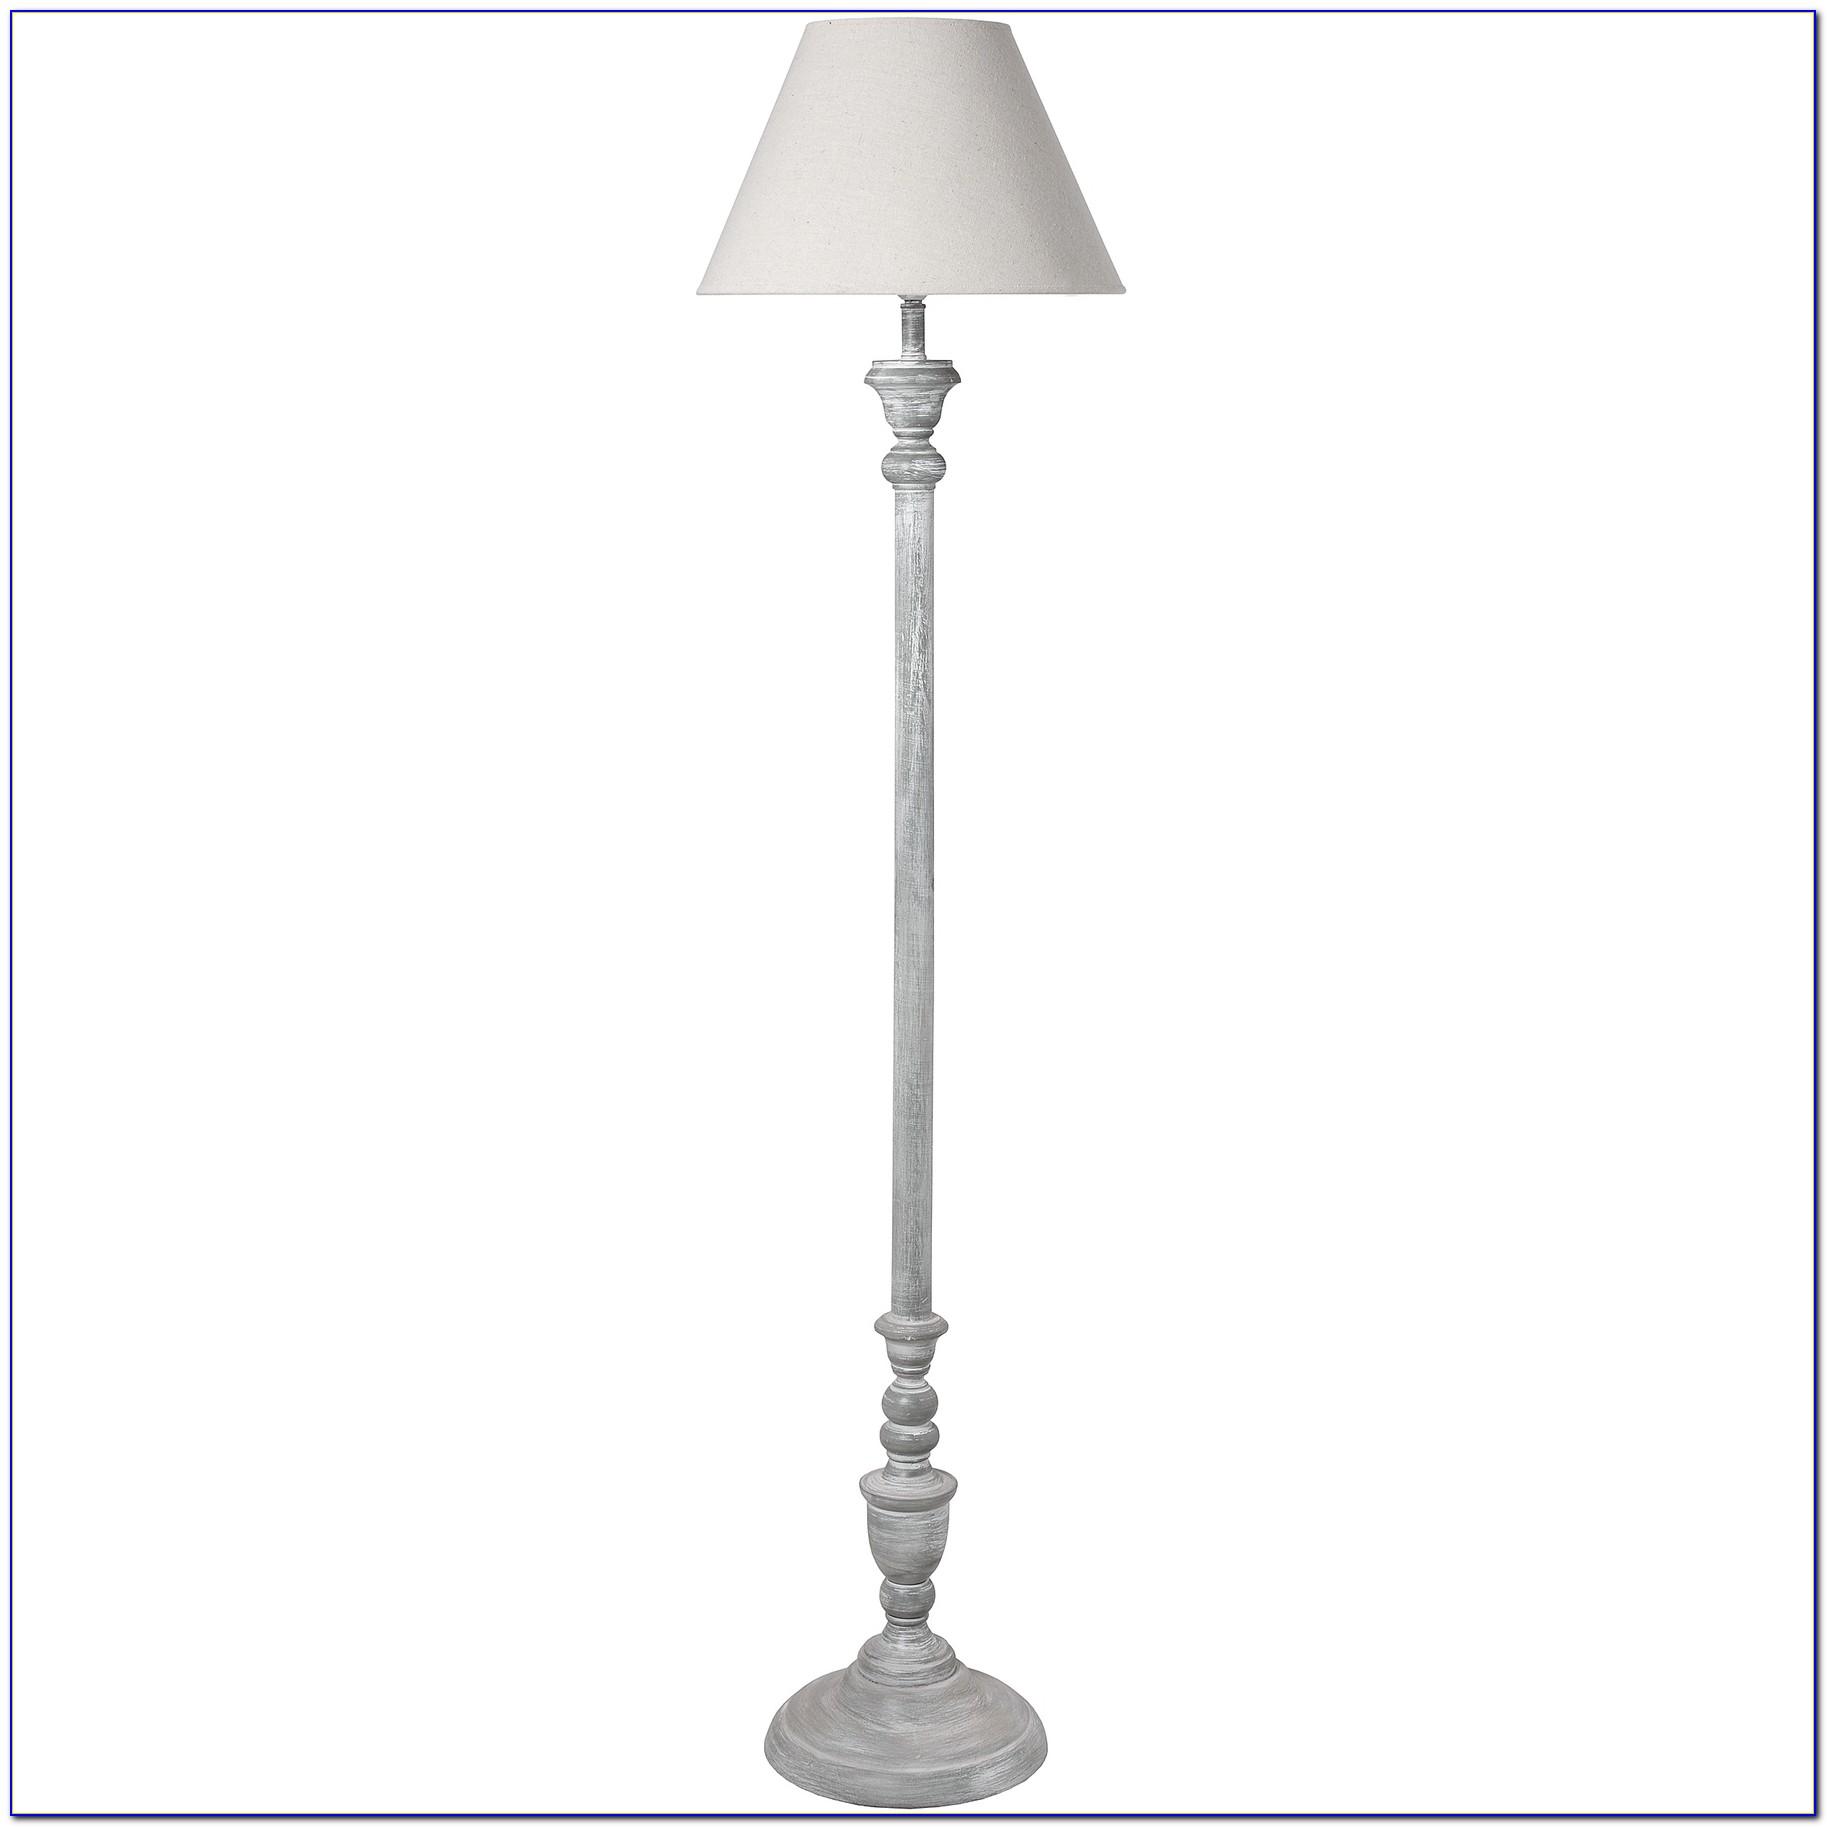 Shabby Chic Floor Lamp Stand